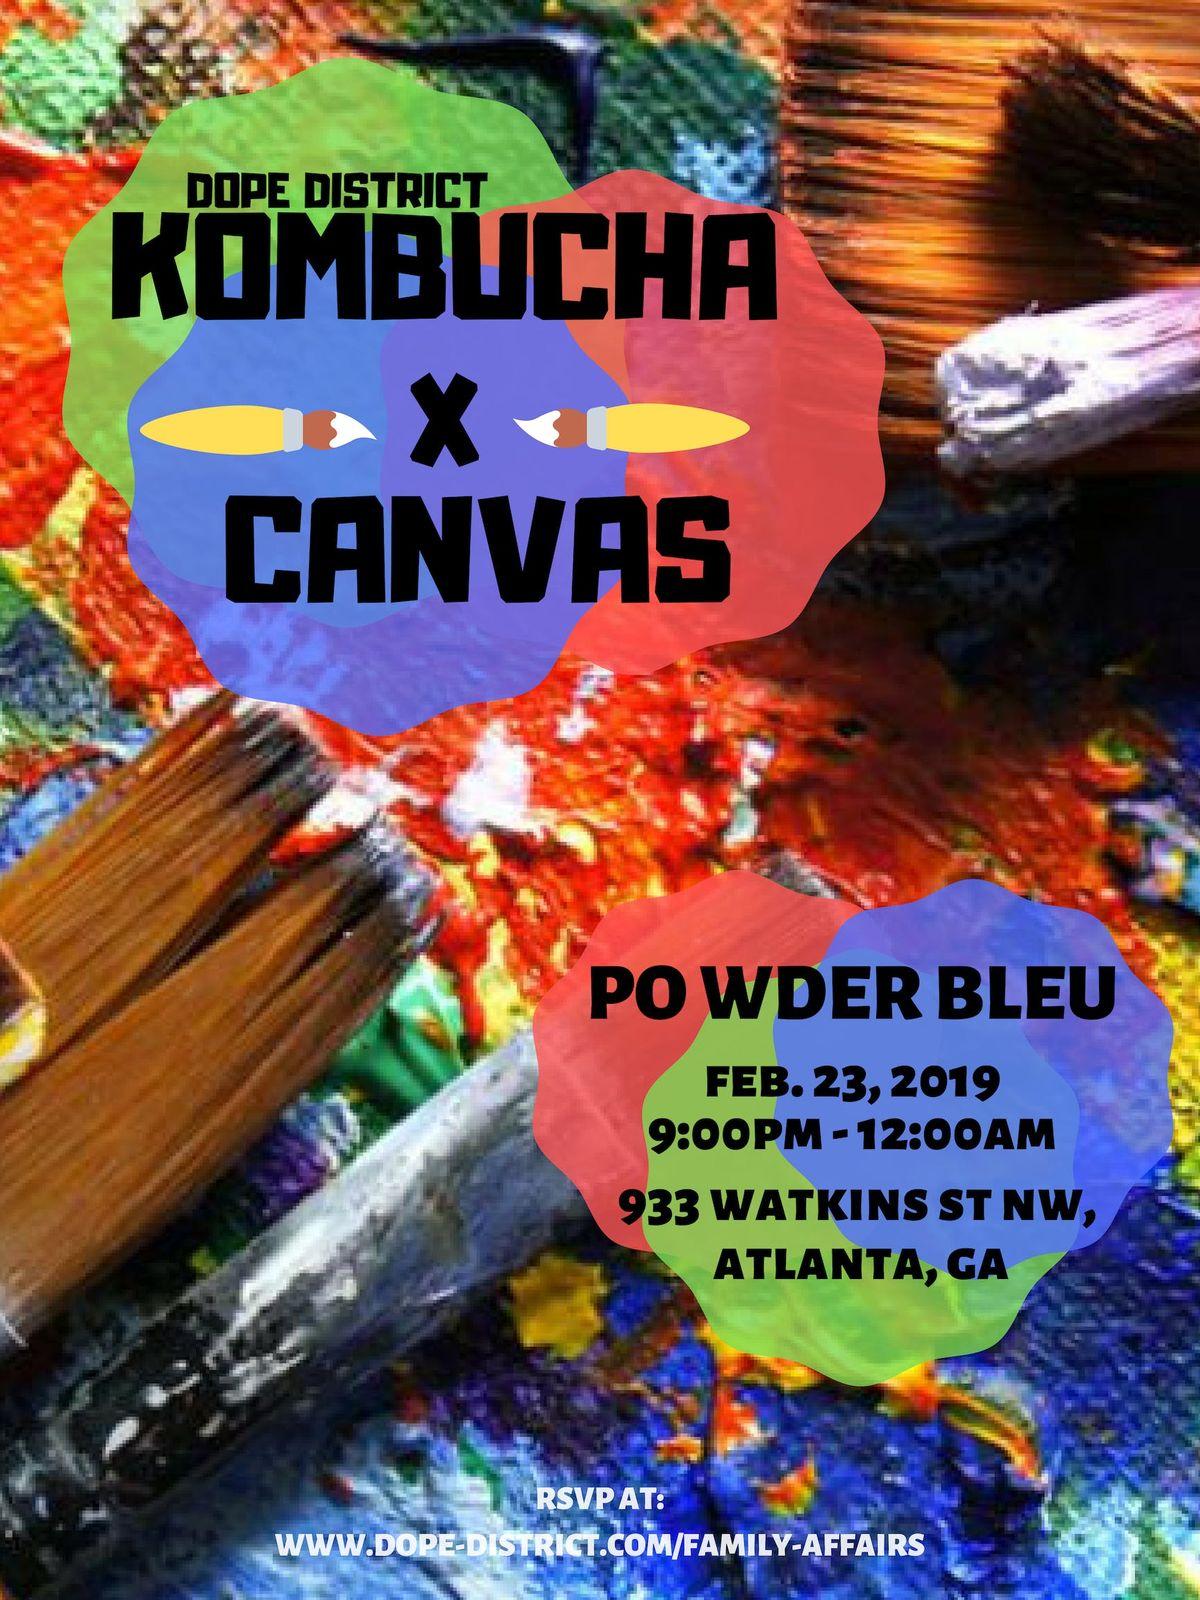 Dope District Kombucha & Canvas